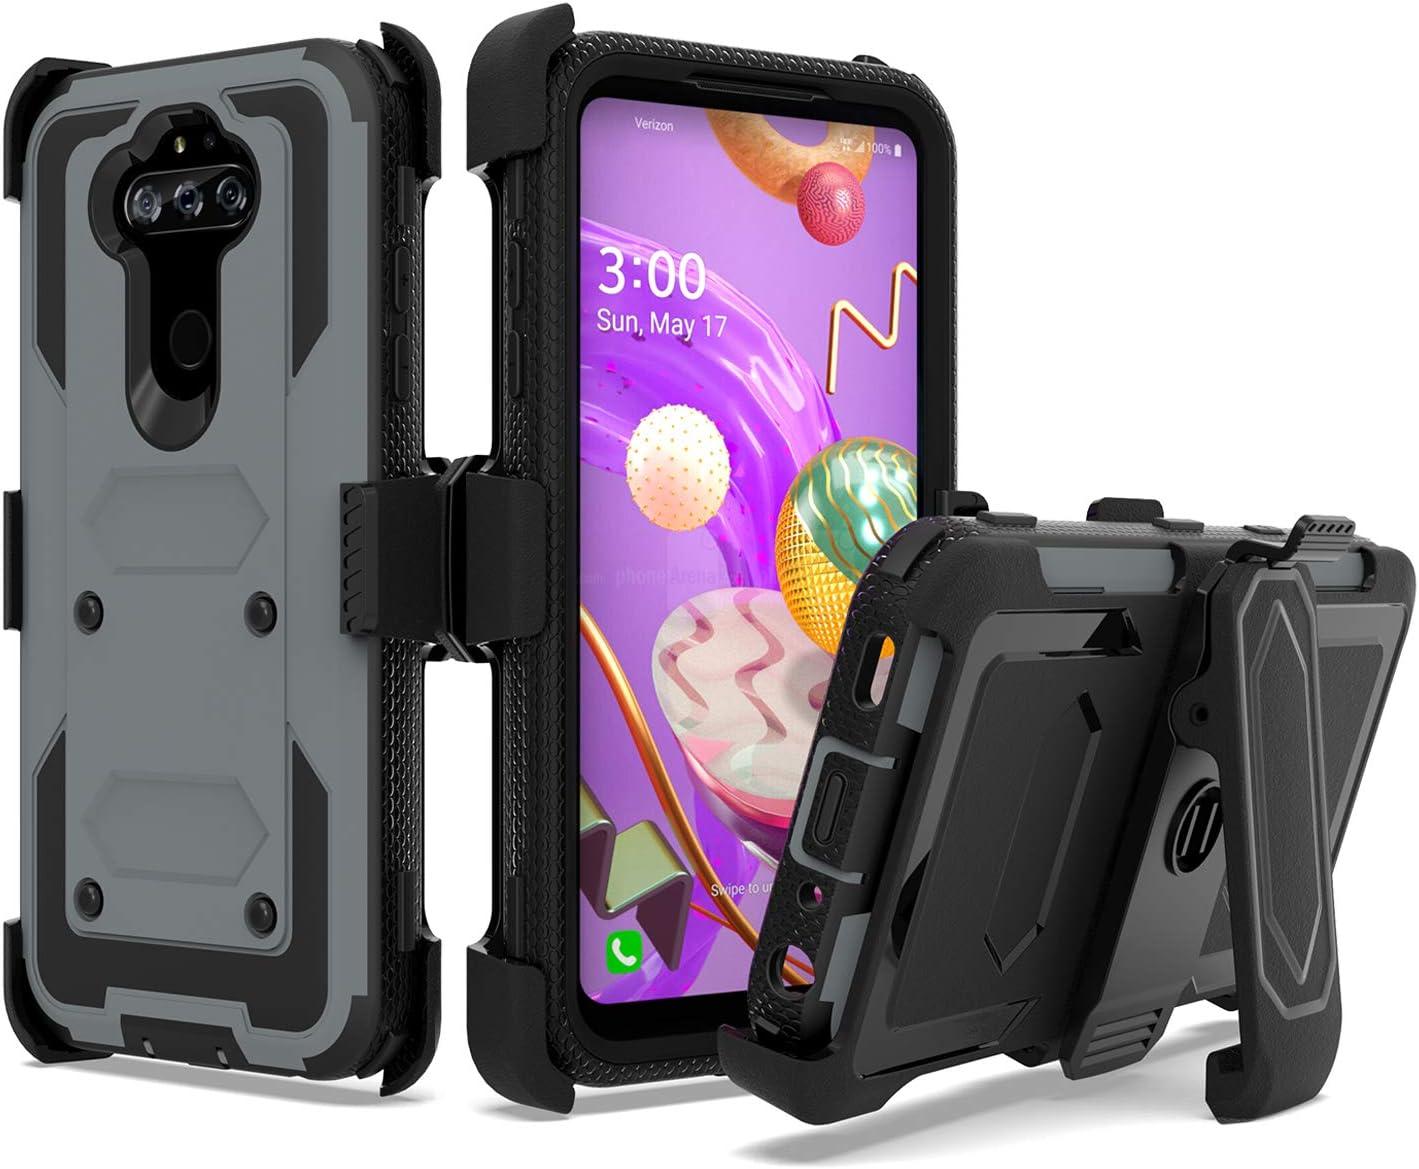 UNC Pro Belt Clip Holster Cell Phone Case for LG Aristo 5/Aristo 5 Plus +/K31/Phoenix 5/Fortune 3/Tribute Monarch/K8x/Risio 4, Heavy Duty Hybrid Shockproof Bumper Case w/Kickstand, Grey/Black